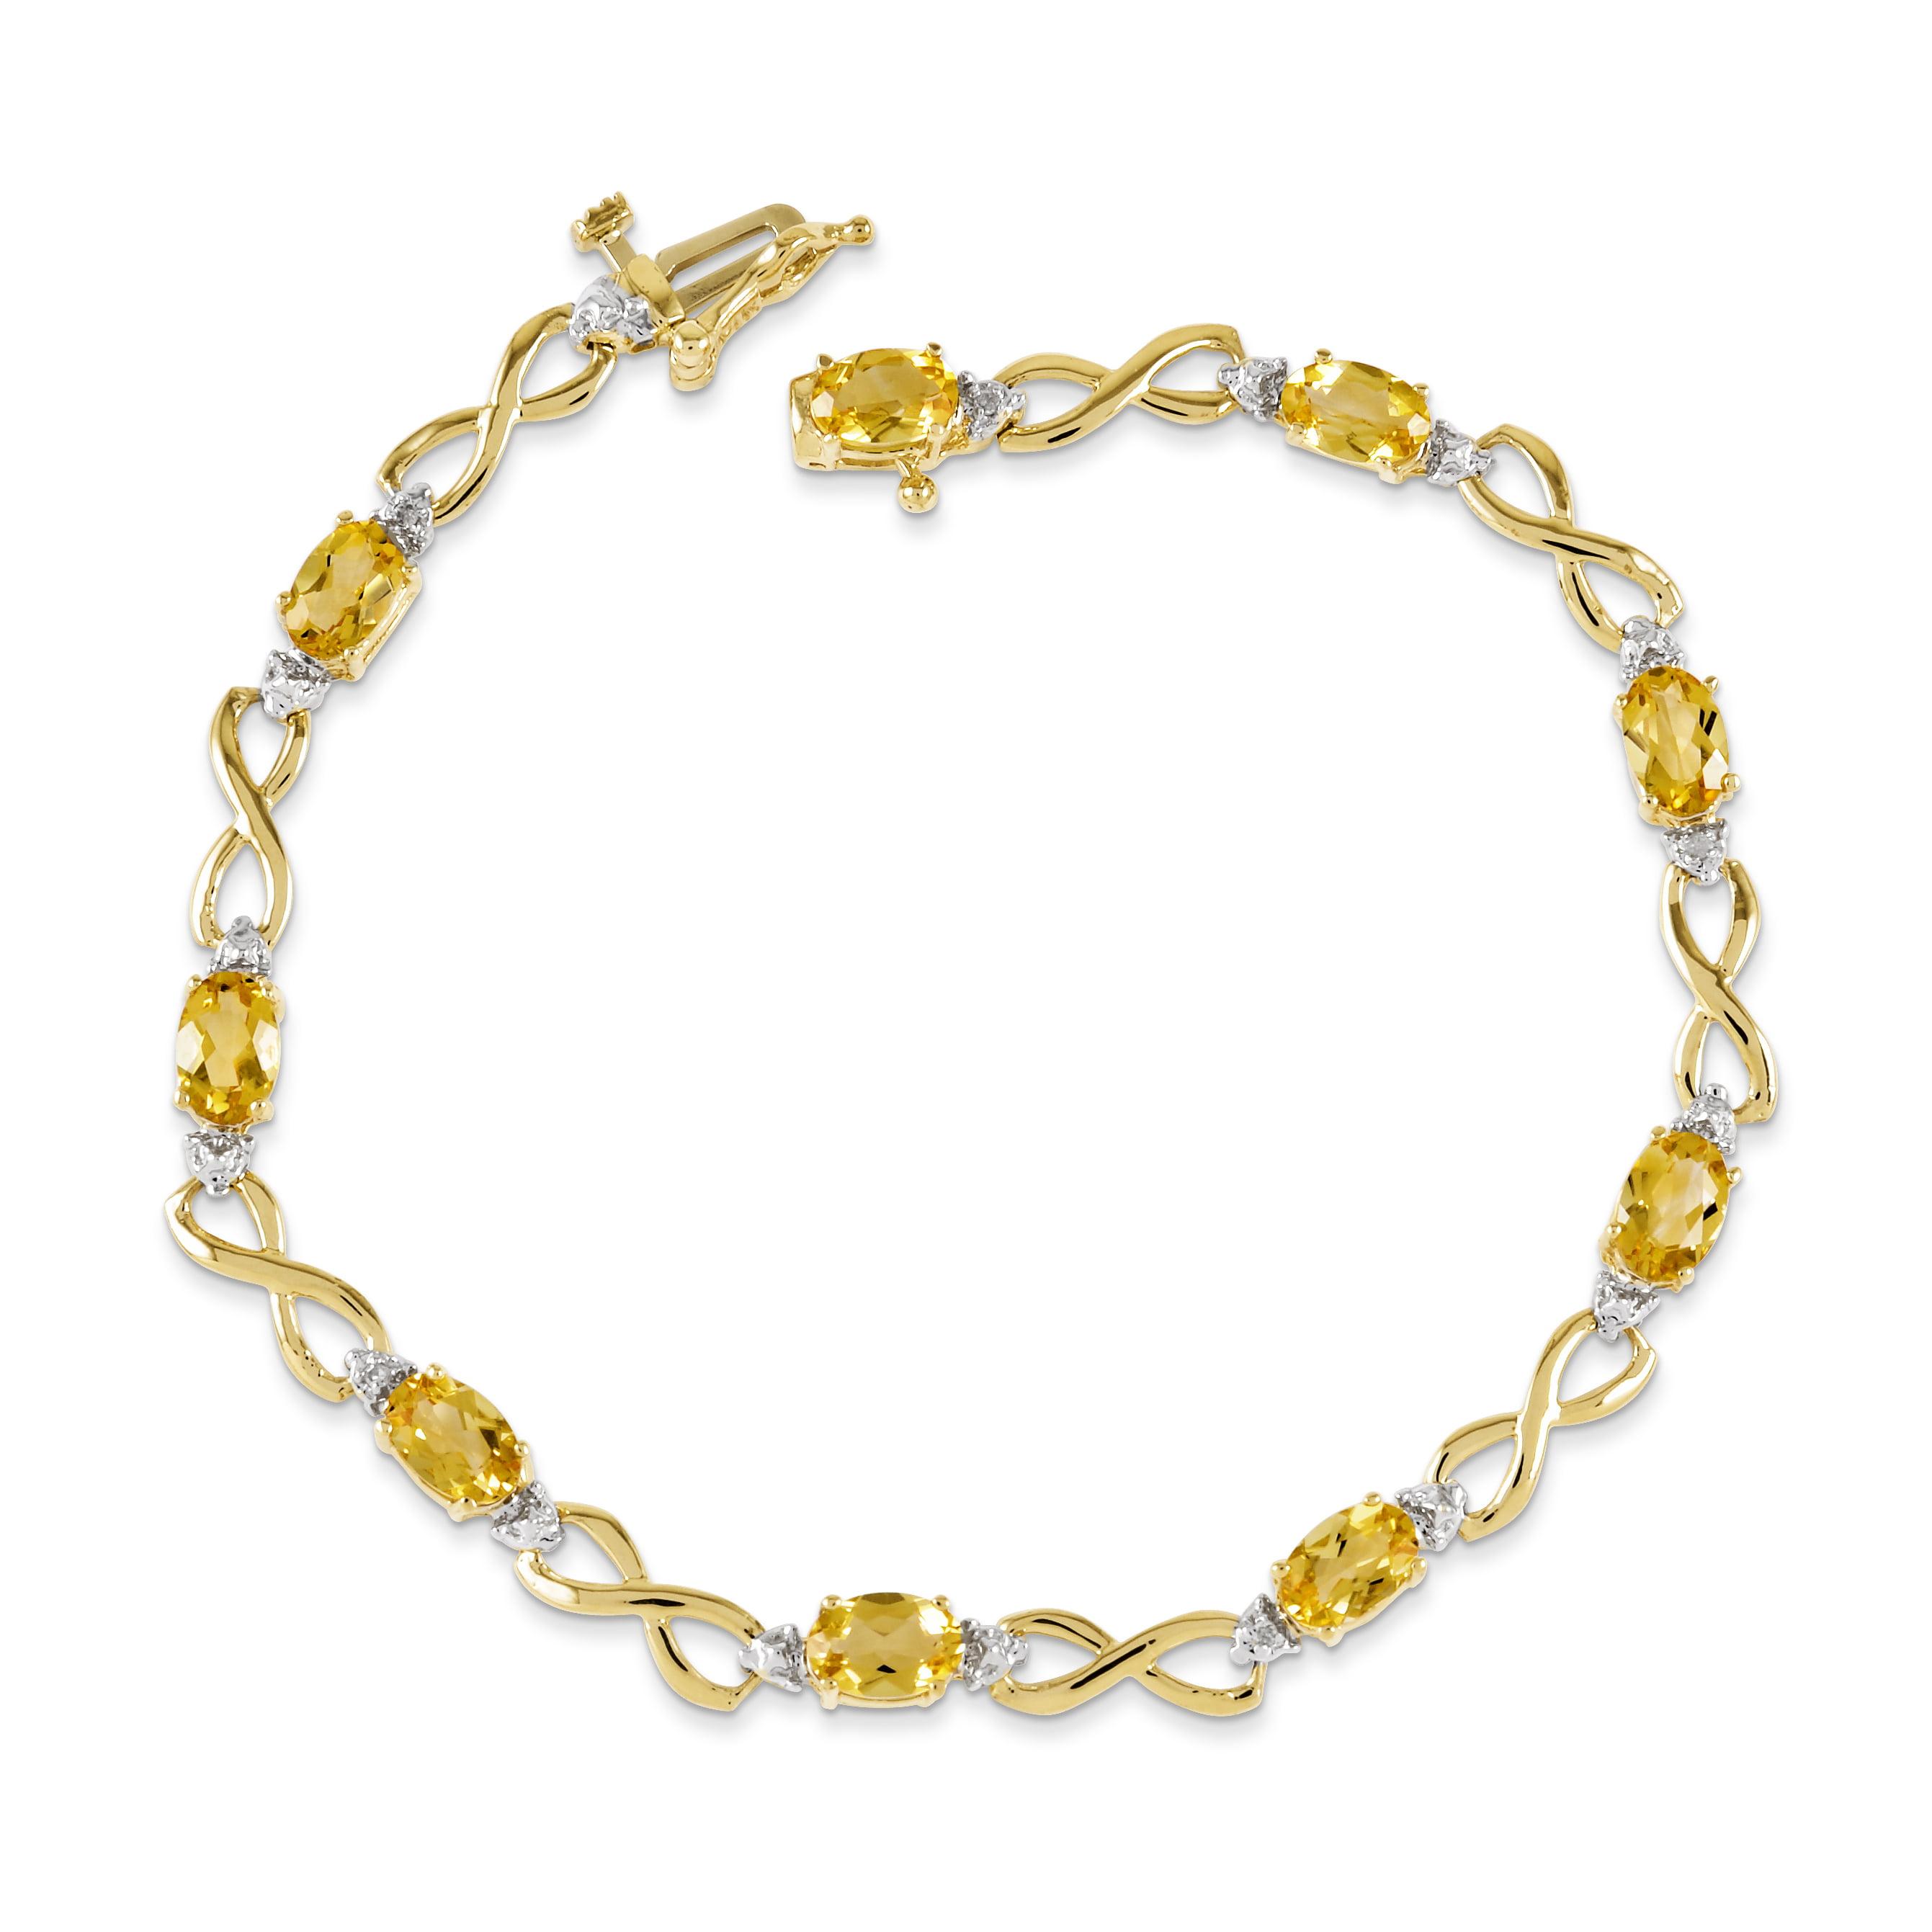 14k Yellow Gold Citrine Diamond Bracelet .03 dwt 6.00 cwt Box Clasp by Kevin Jewelers